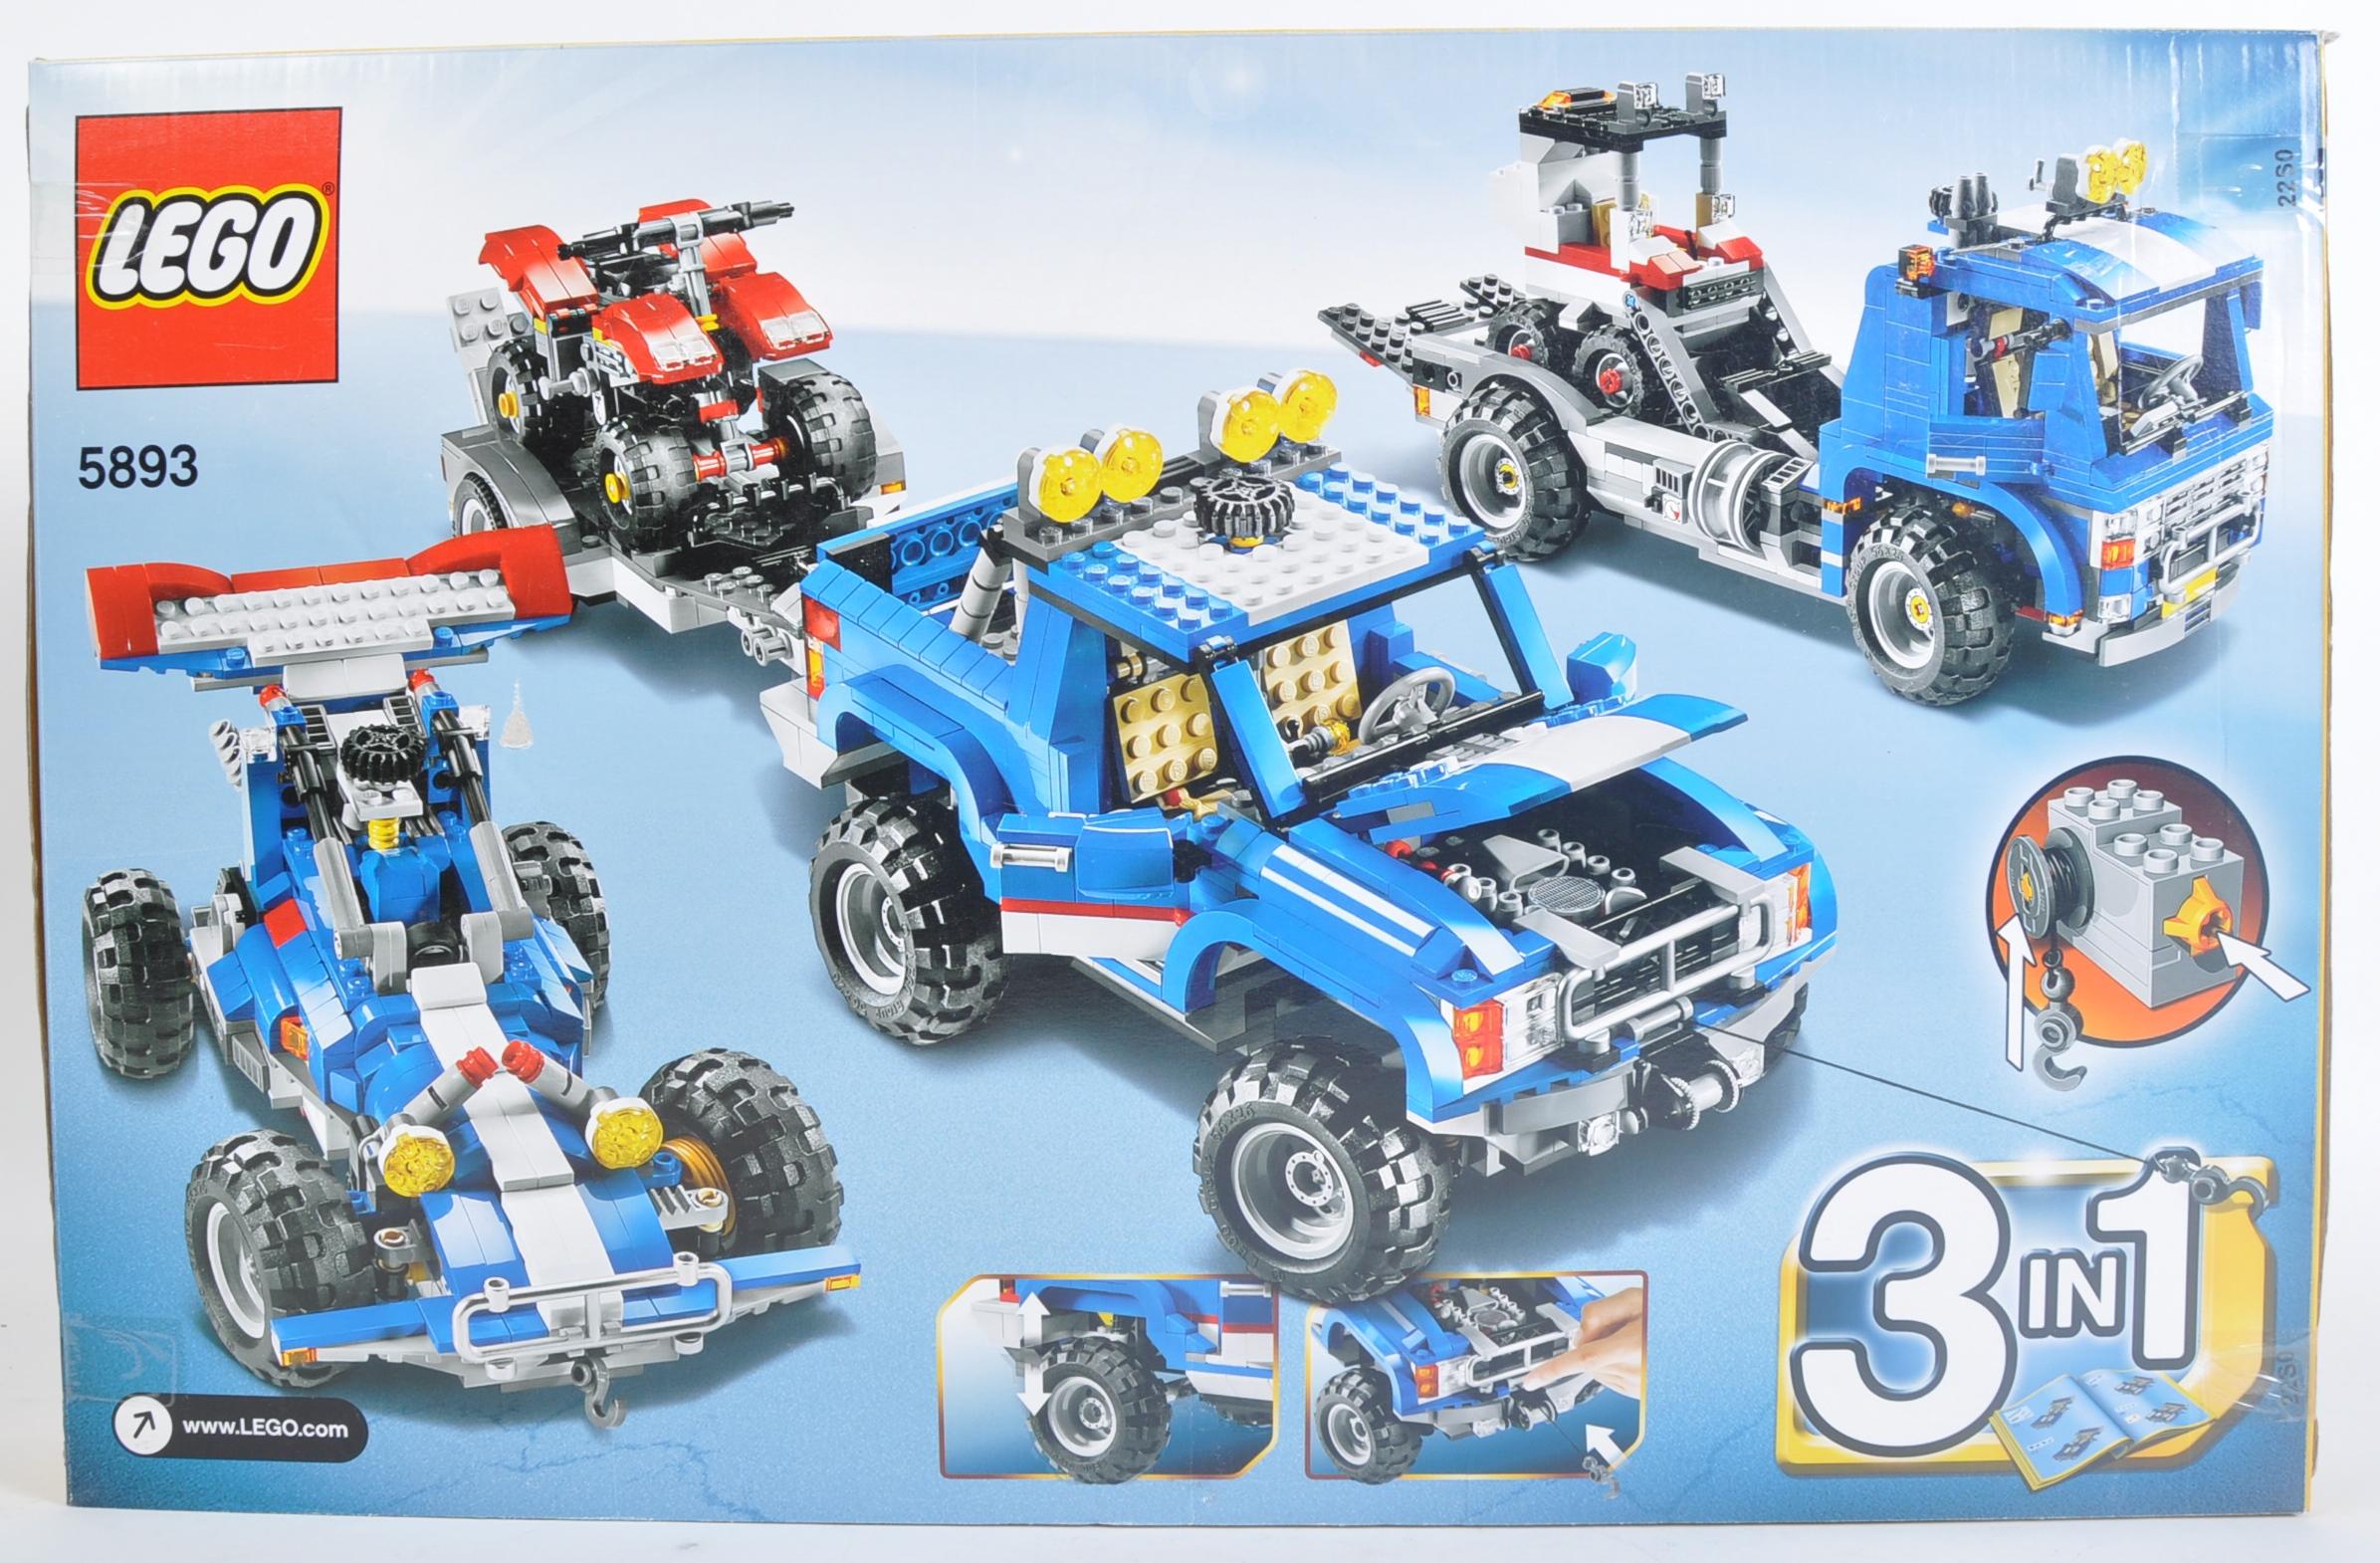 LEGO SET - LEGO CREATOR - 5893 - OFF ROAD POWER - Image 2 of 4